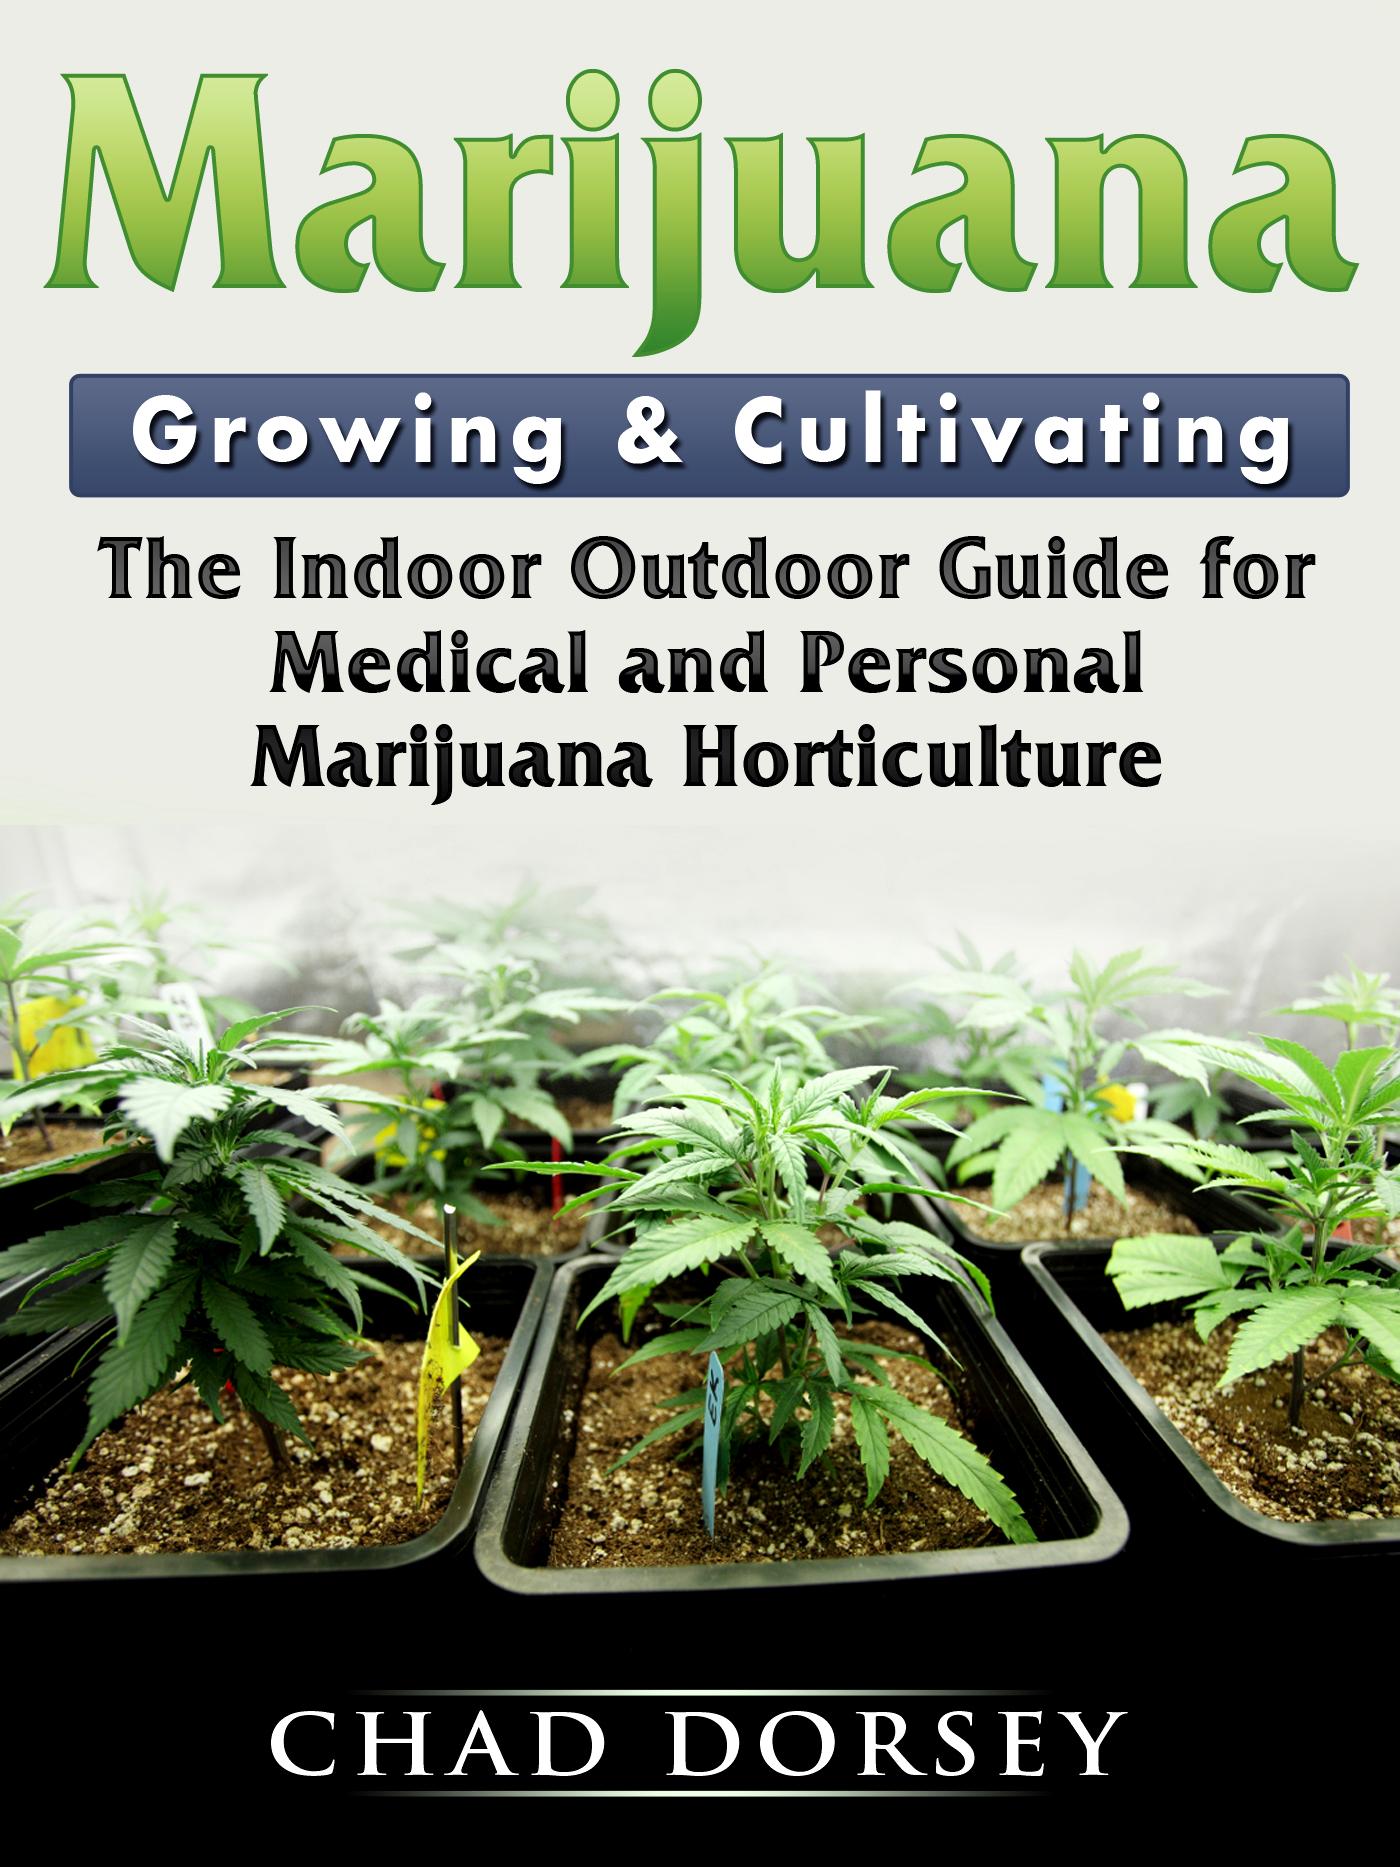 Marijuana growing & cultivating the indoor outfor medical and personal marijuana horticulture